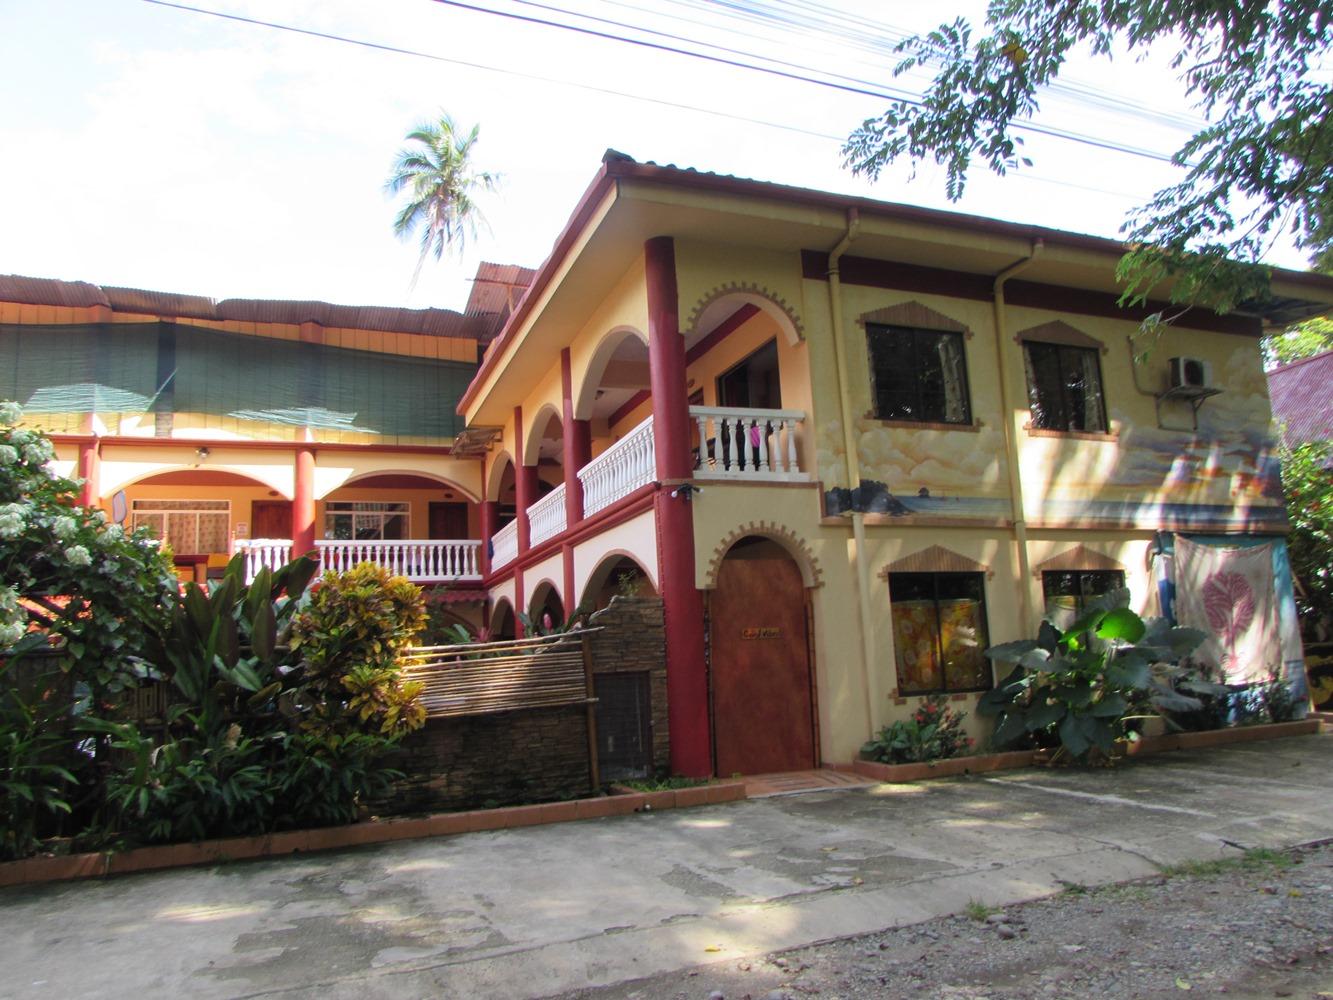 946 Dominical Hotel 001080.JPG